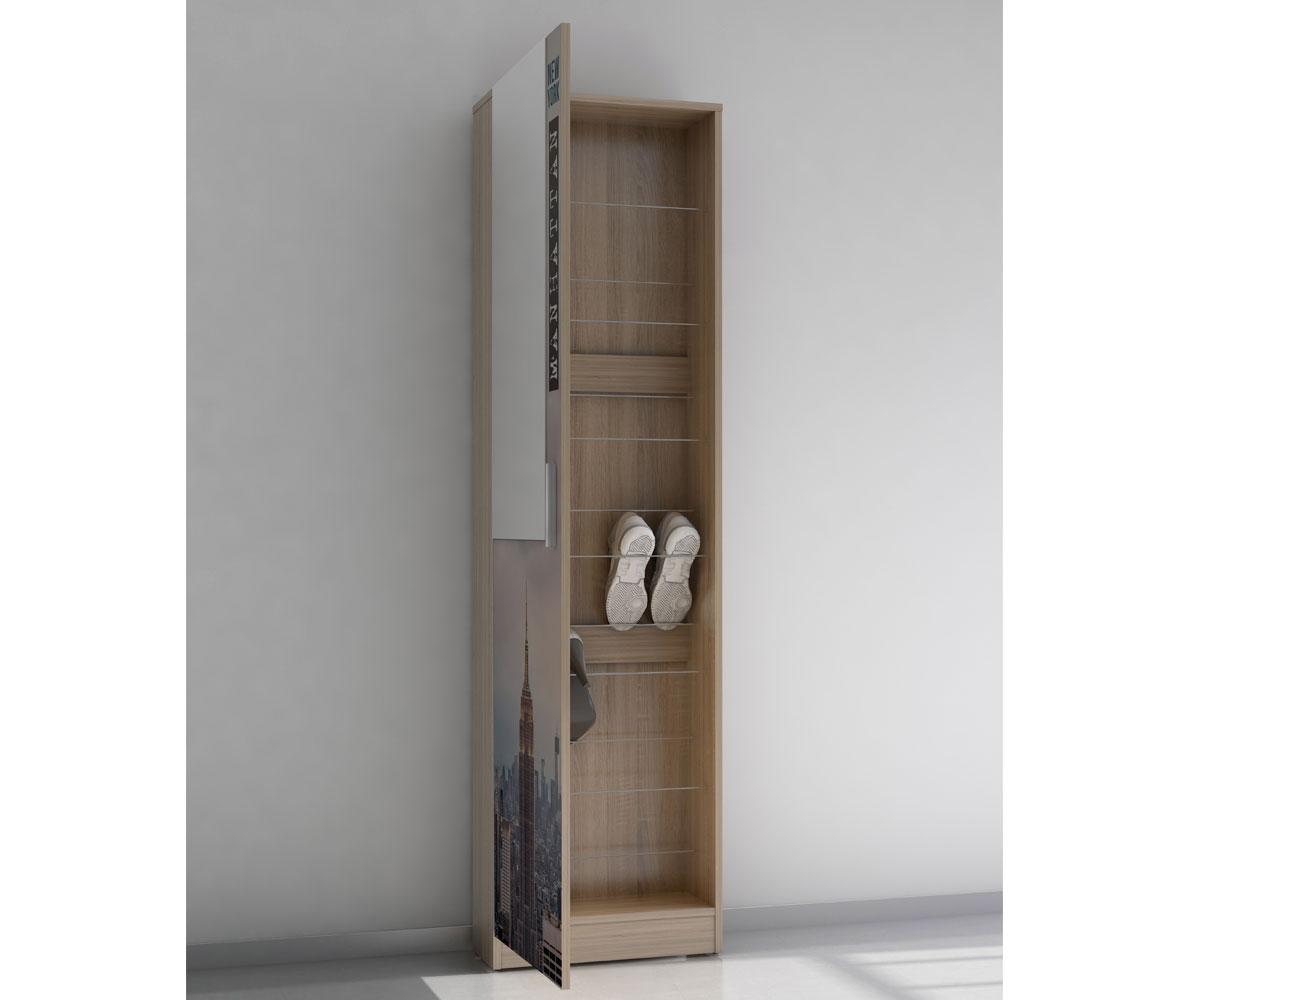 Recibidor zapatero con espejo Manhattan (4557) | Factory del Mueble ...